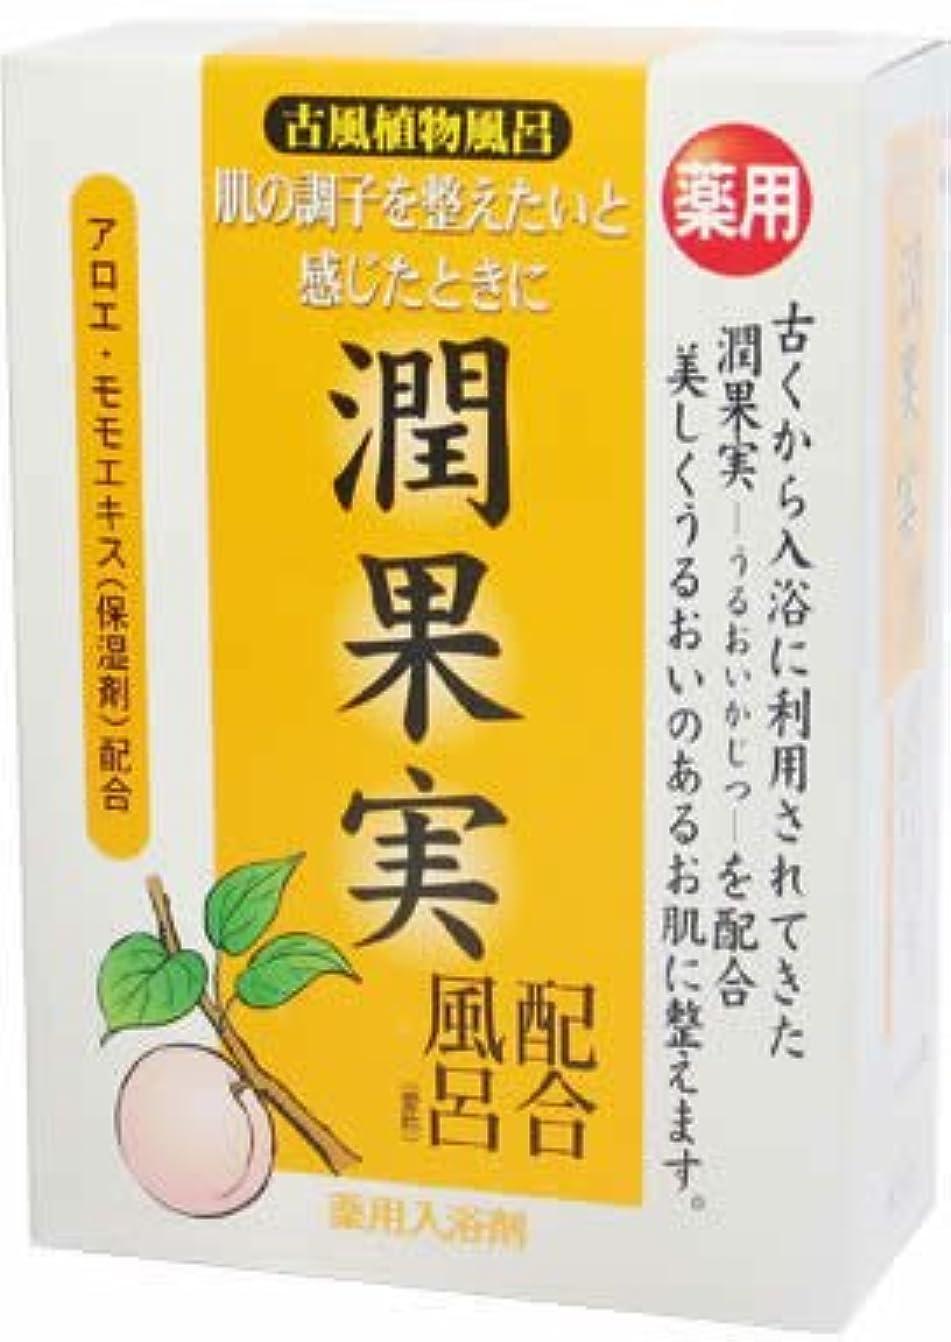 雇用者ストレンジャー静脈古風植物風呂潤果実配合 25gX5包 [医薬部外品]